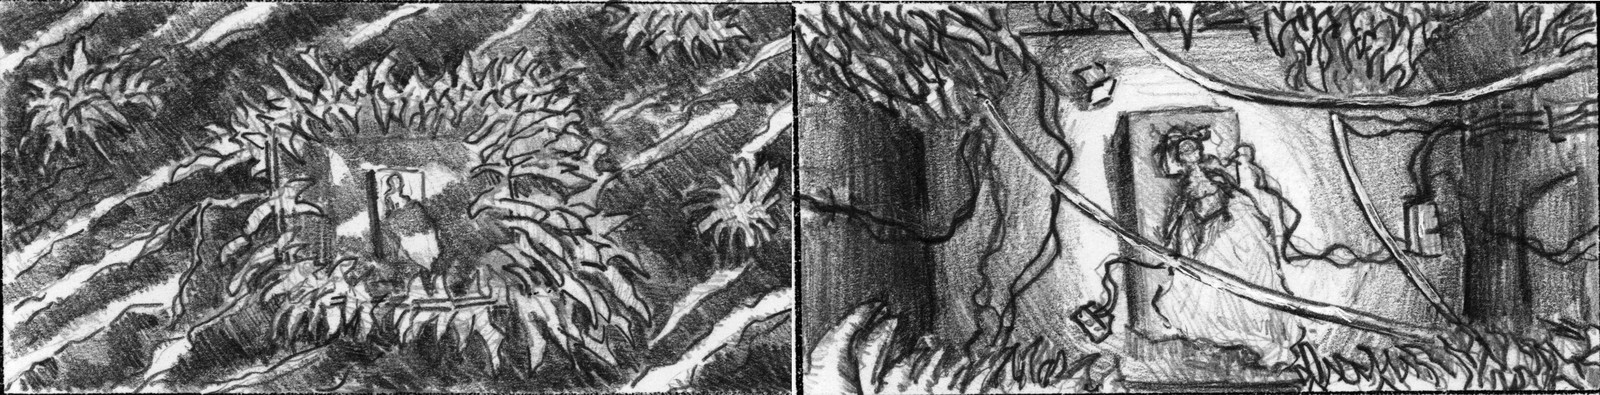 Early storyboard sketch.